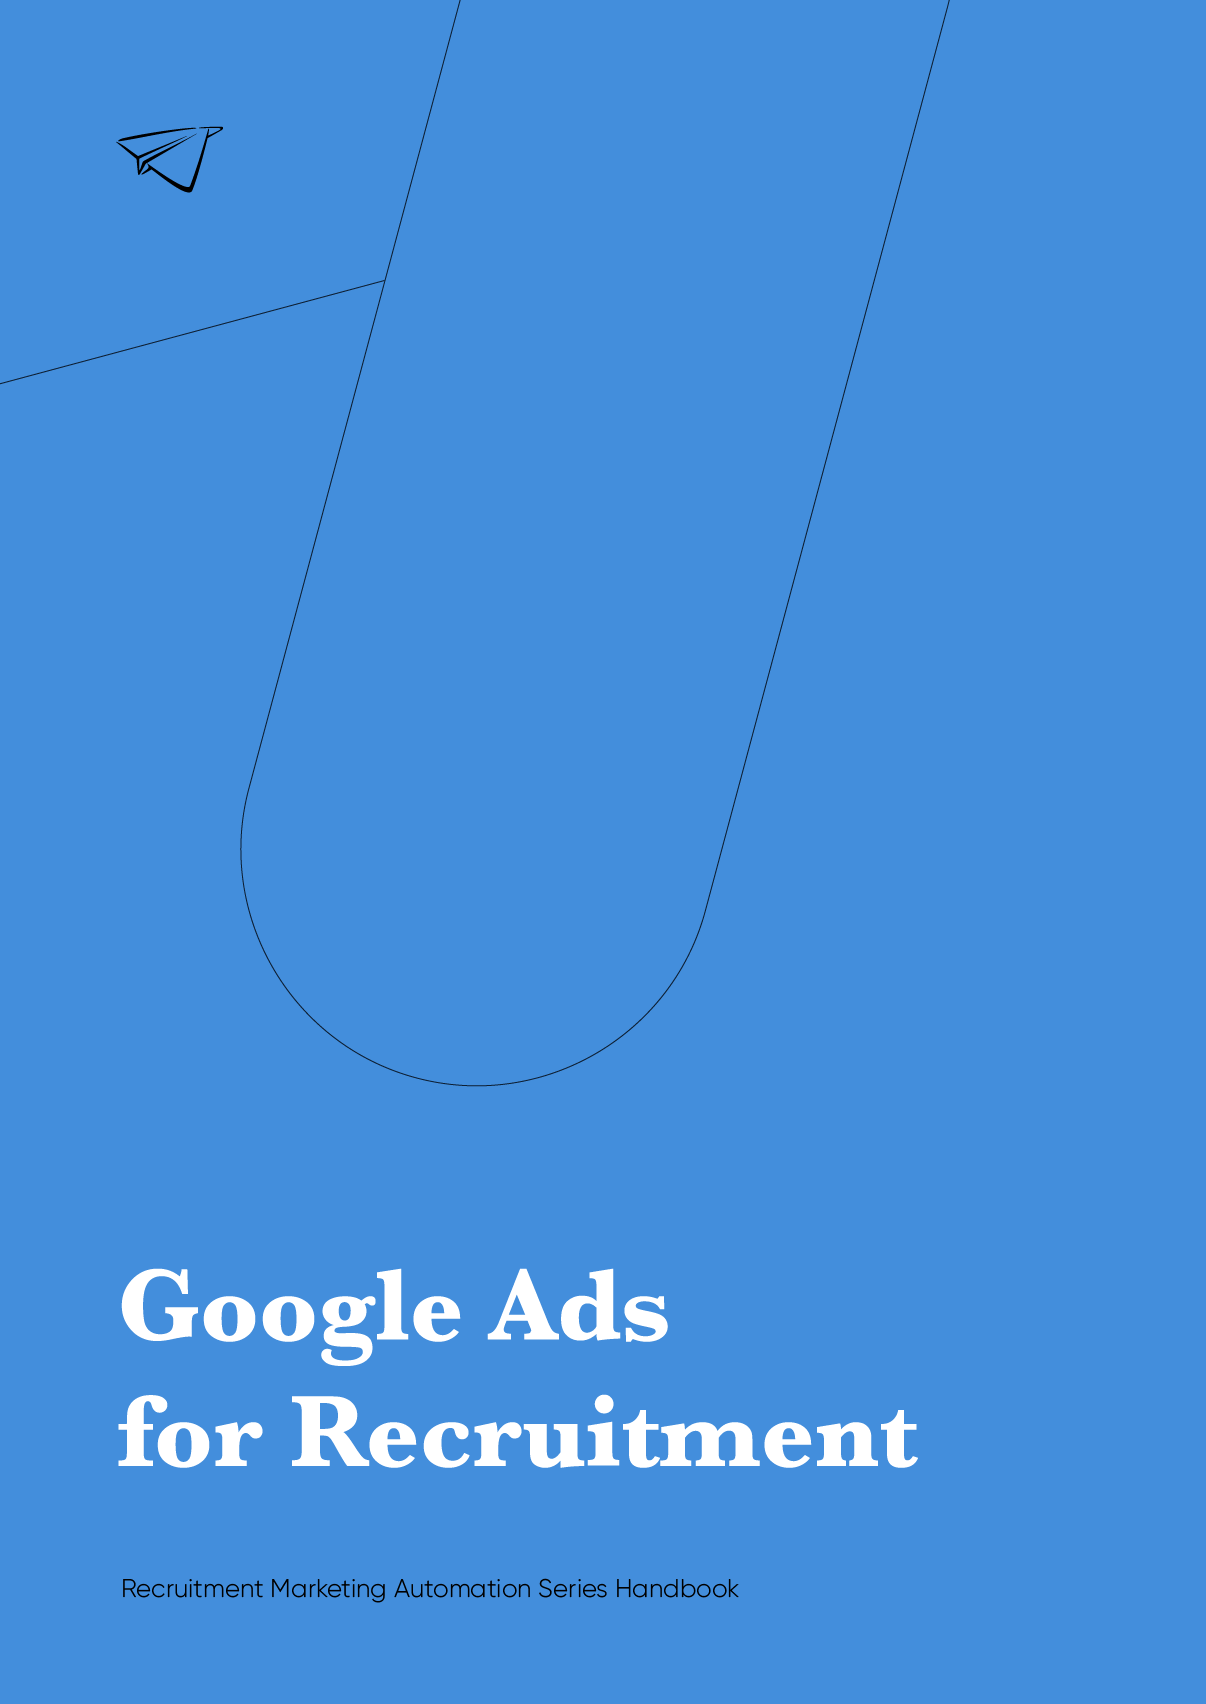 Google Ads for Recruitment ebook